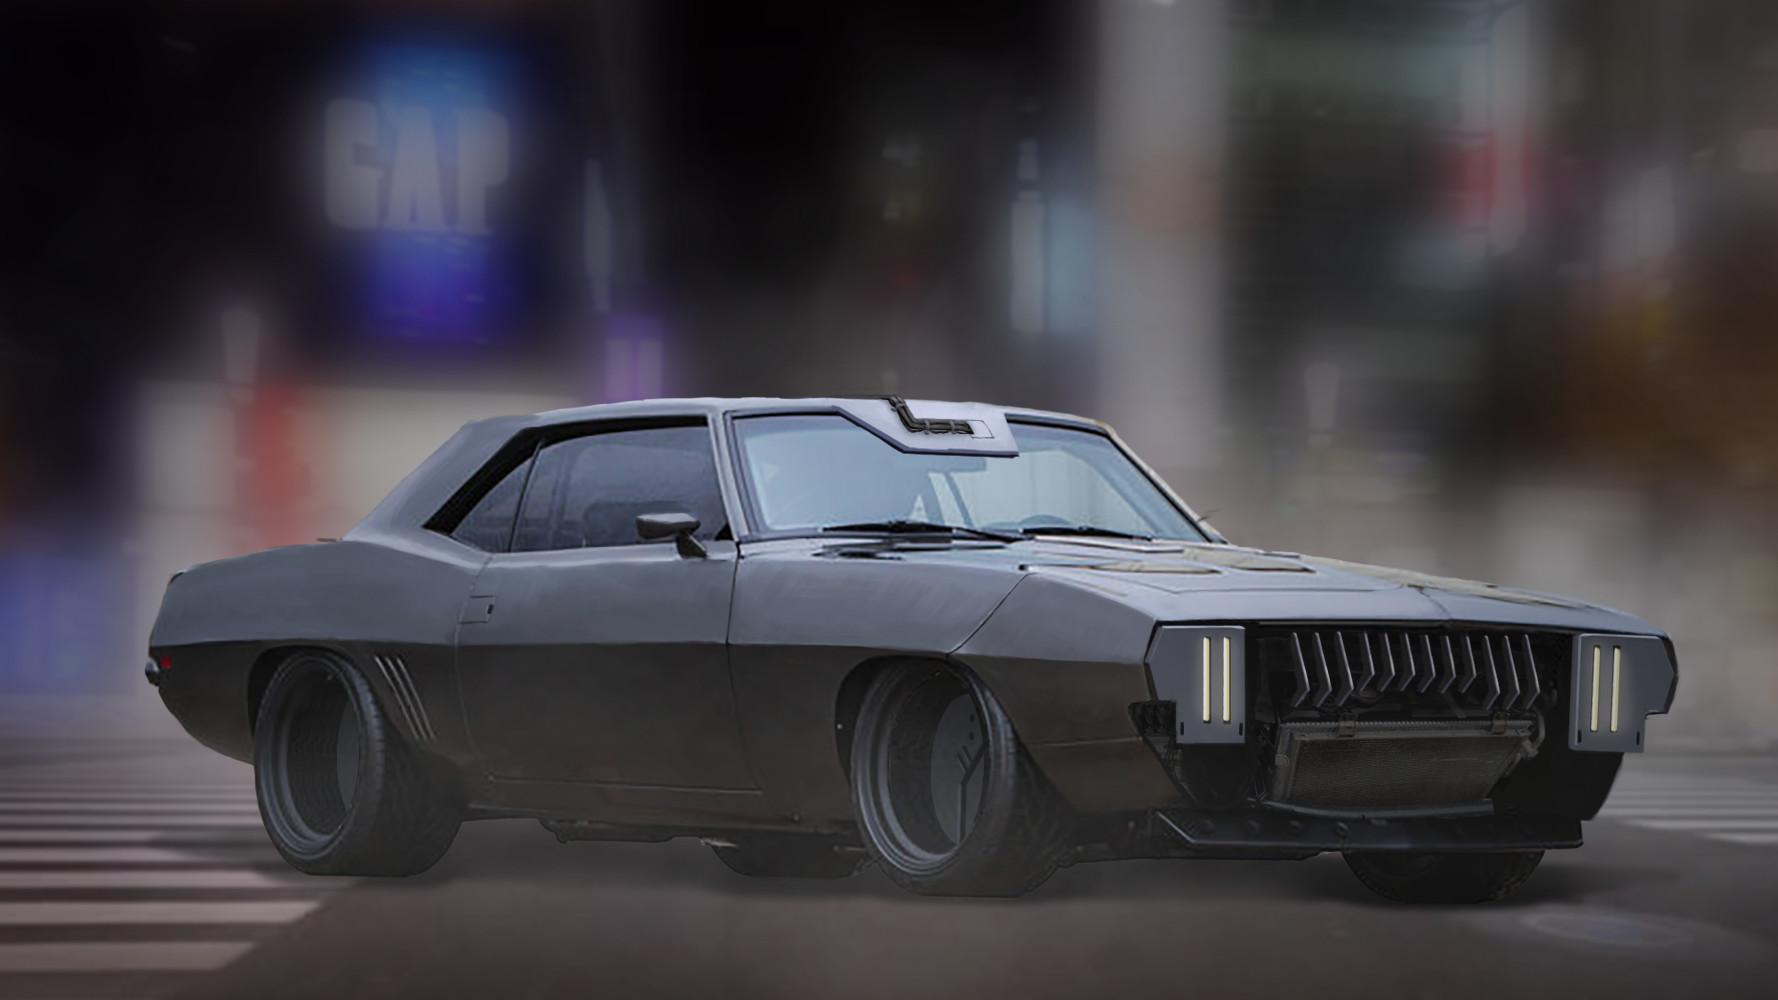 Emile van den berghe cyberpunk muscle car